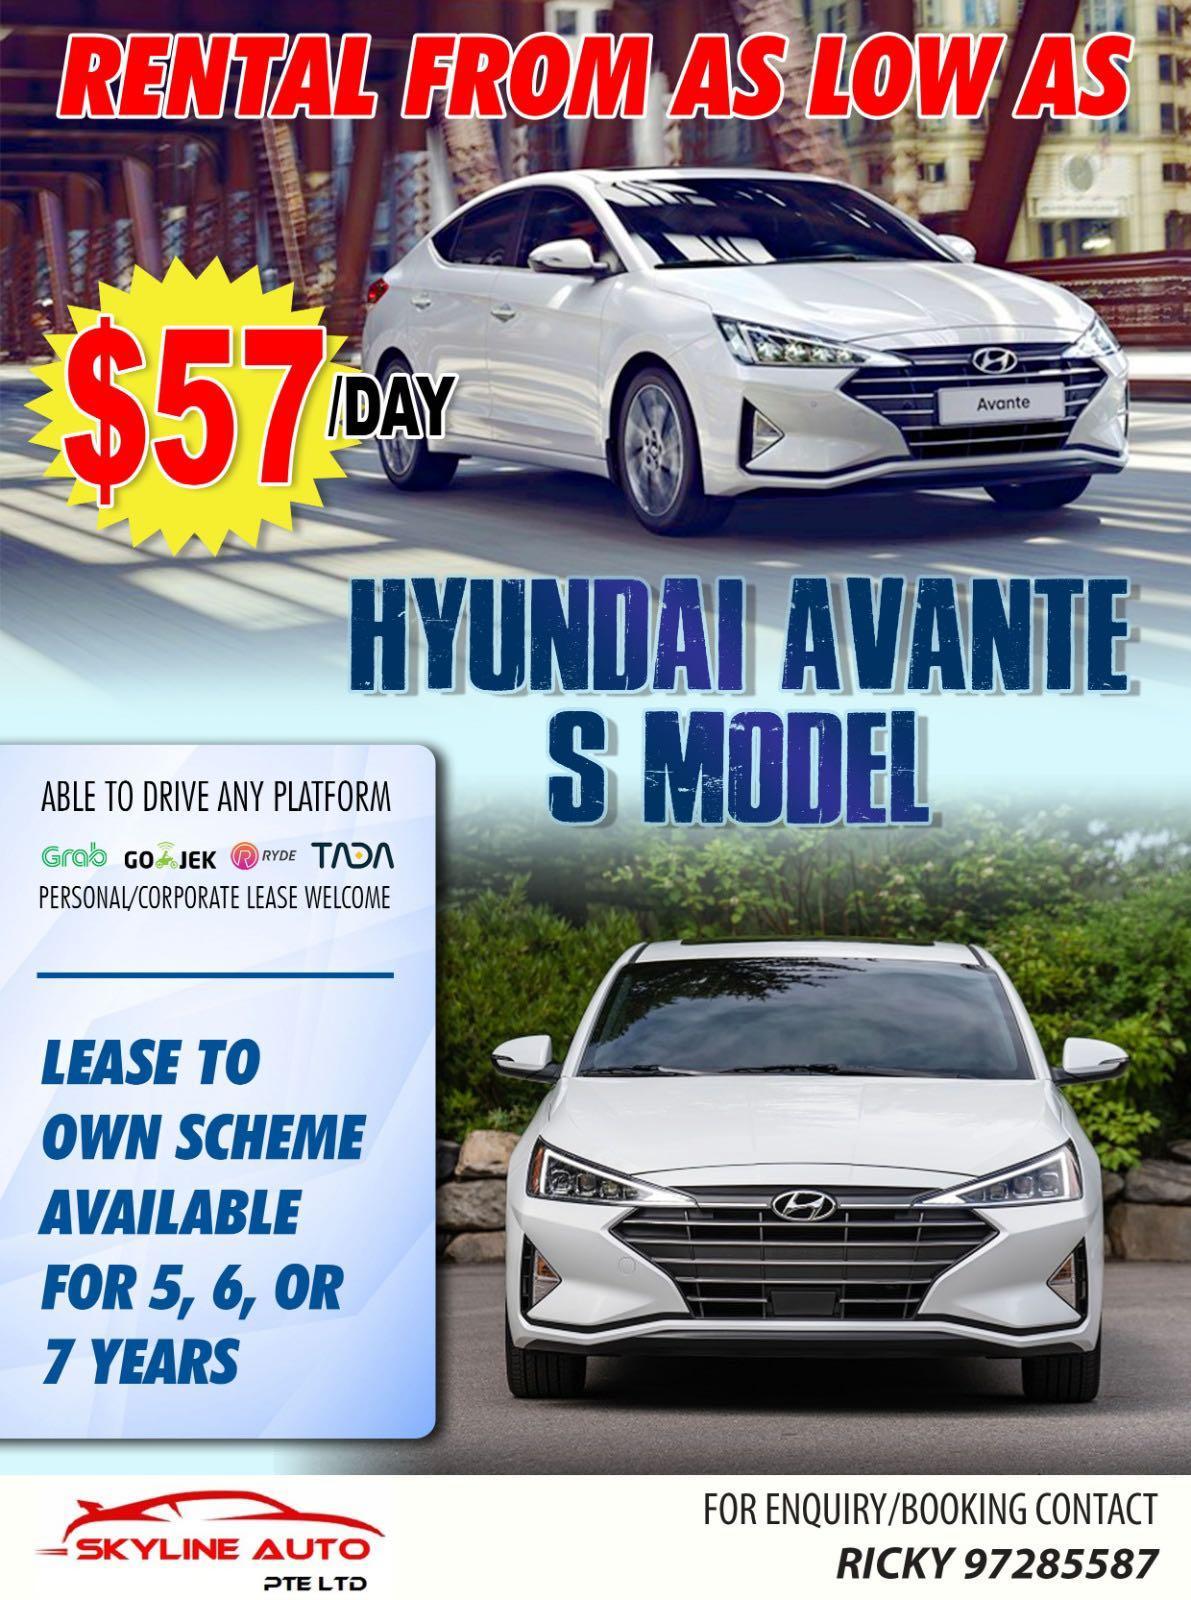 Brand New Hyundai Avante S MODEL 1.6A For Rent